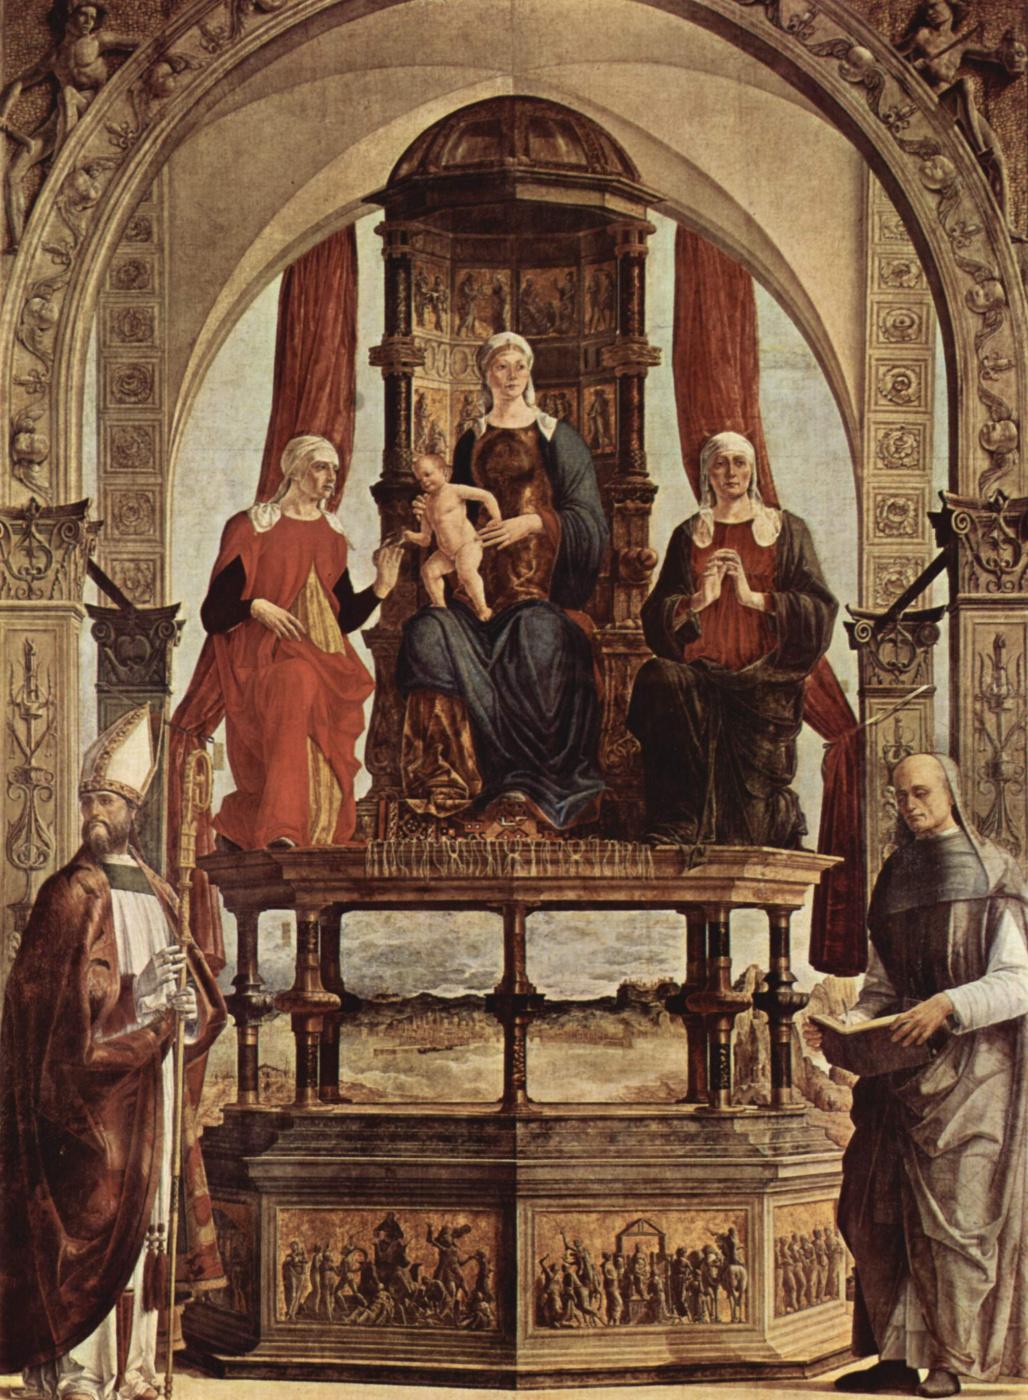 Ercole de ' Roberti. The Altar Portuense. Madonna enthroned and SS. Augustine, Anna, Elizabeth, Peter Damiani